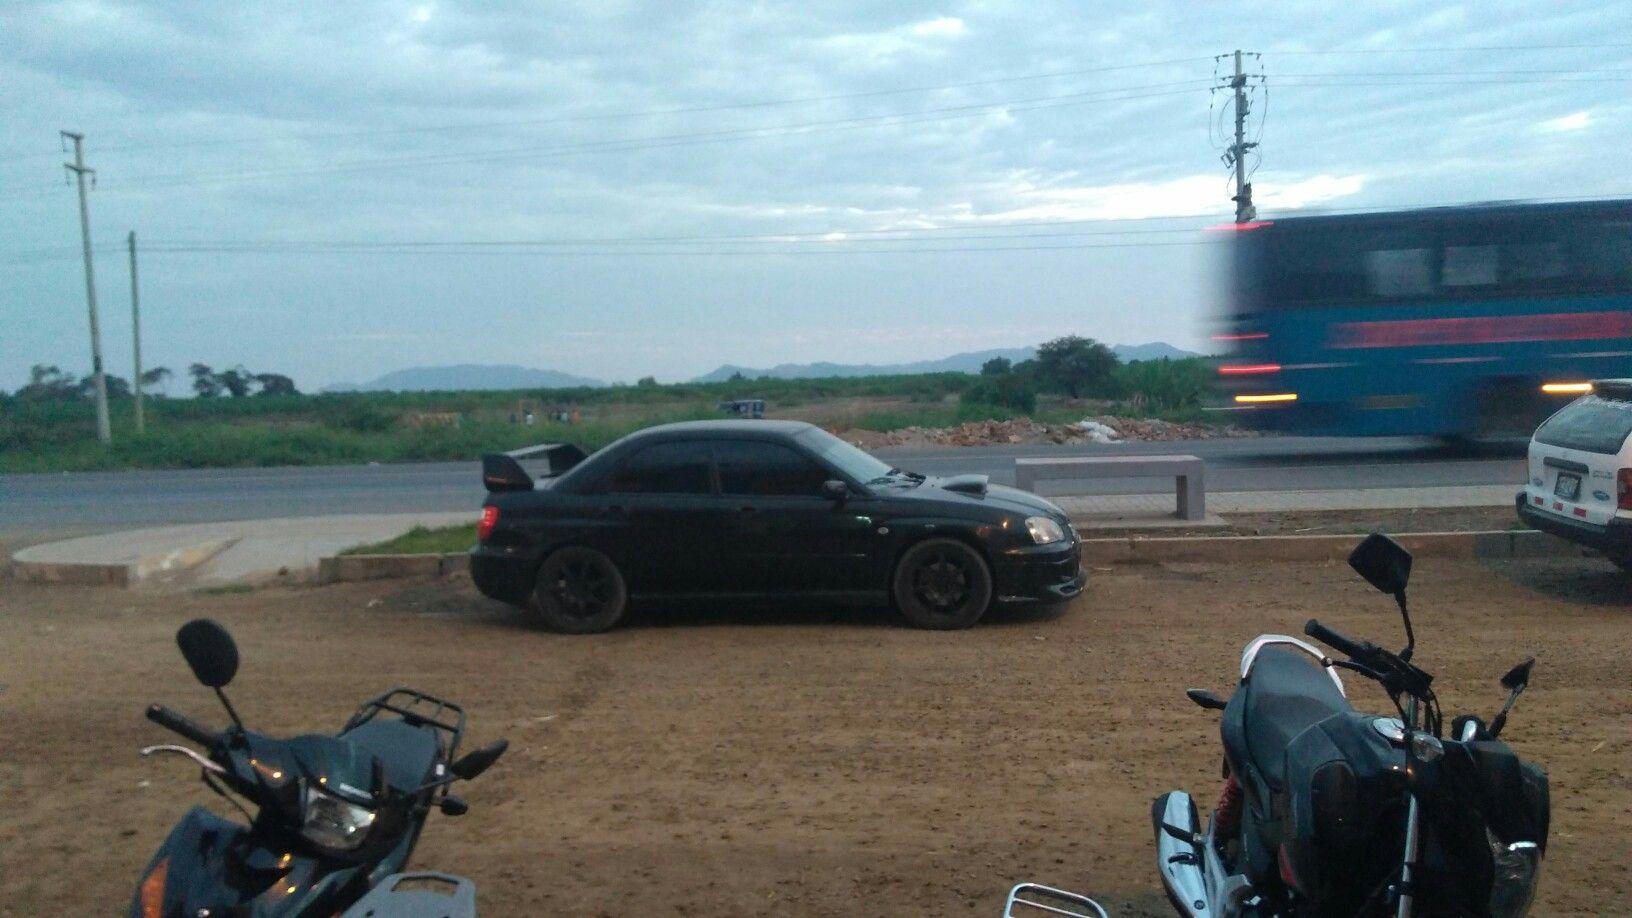 Subaru impreza sti Subaru impreza sti, Subaru impreza